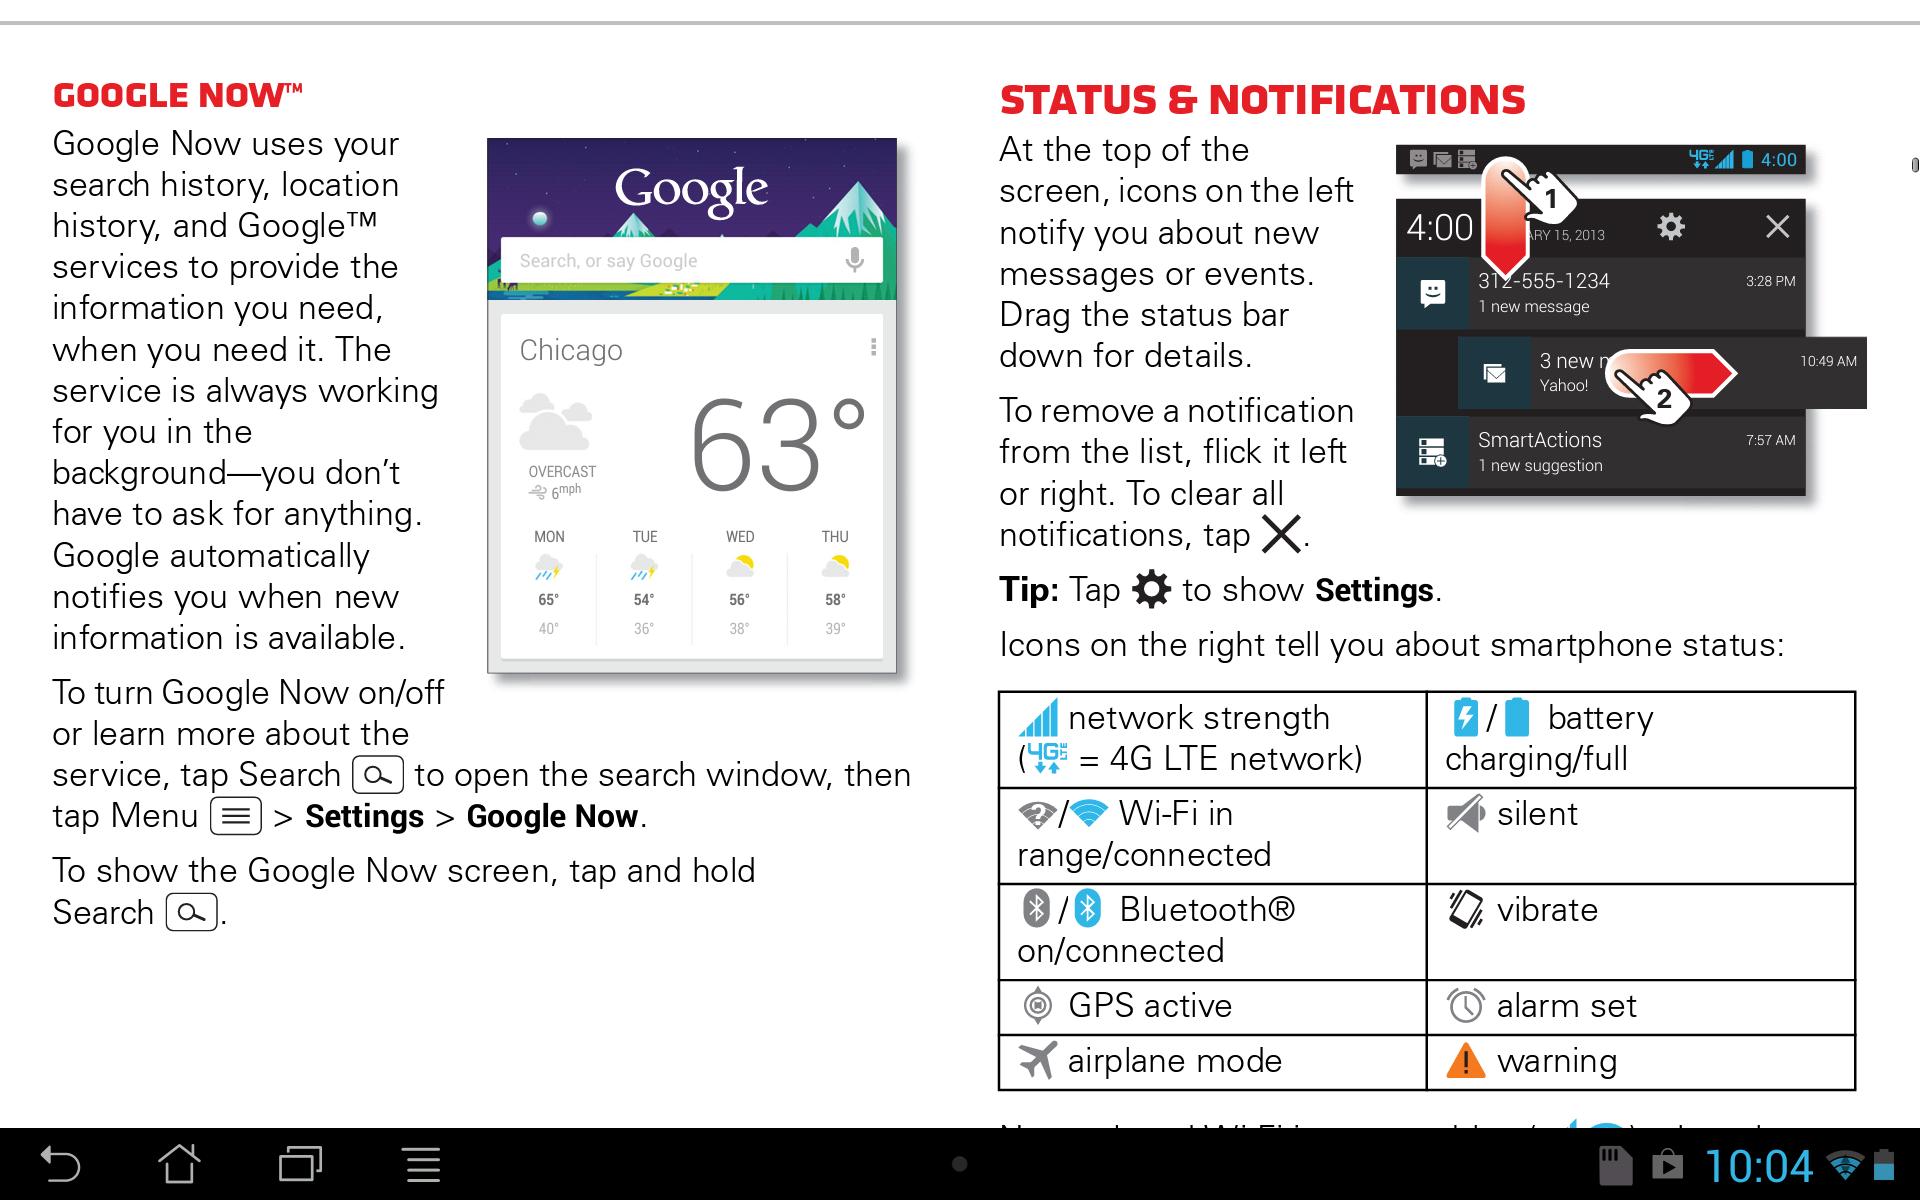 Screenshot_2013-04-13-10-04-45.png